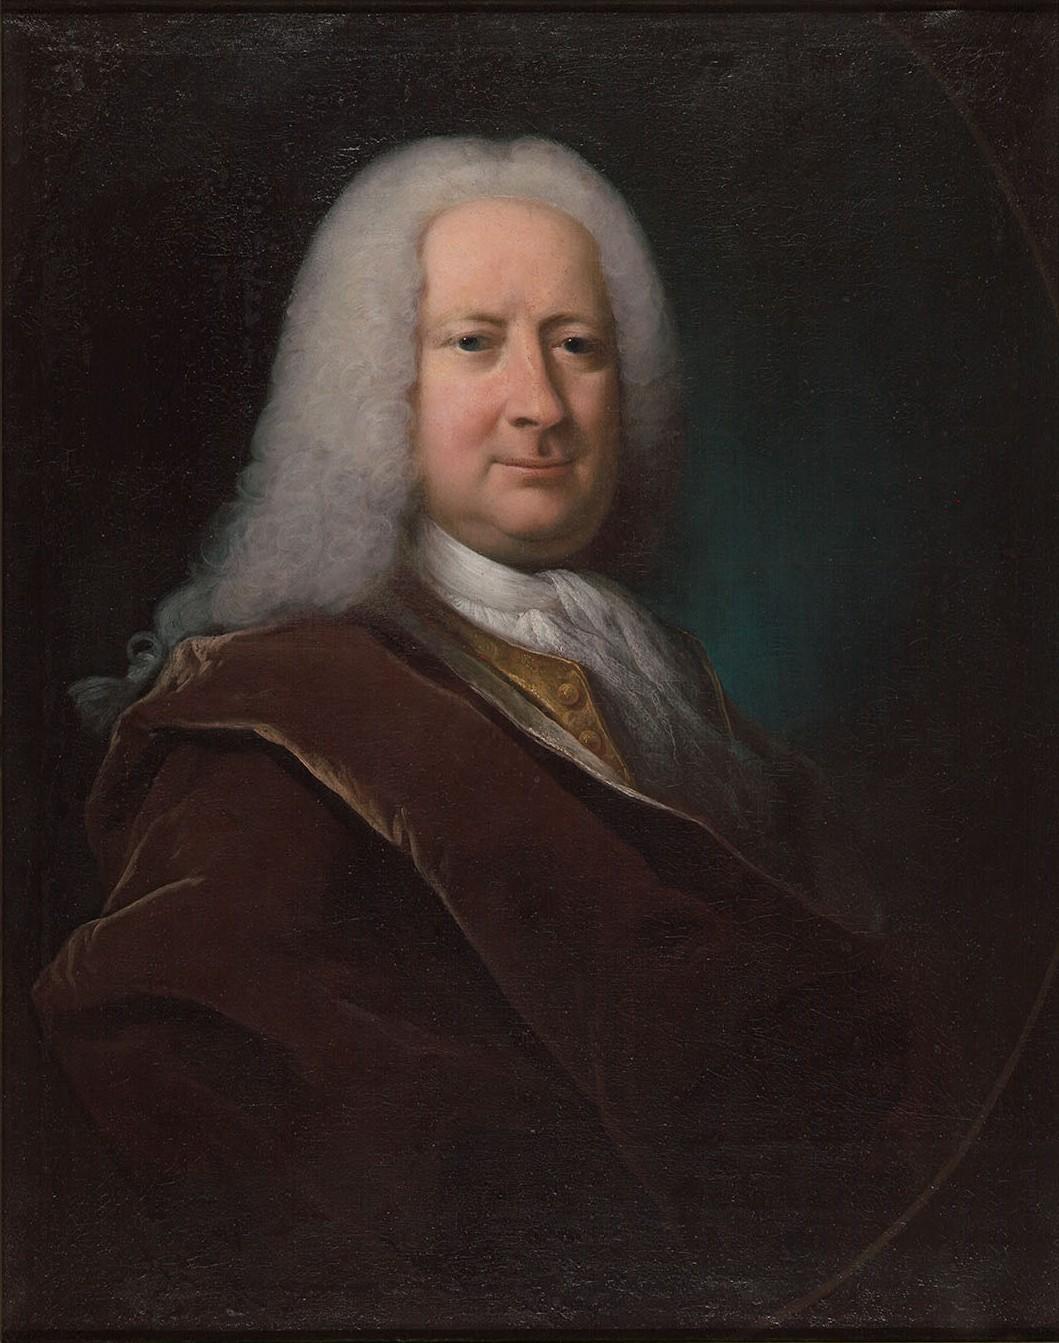 Johann Friedrich Tönnies, Maler: Anton Paulsen